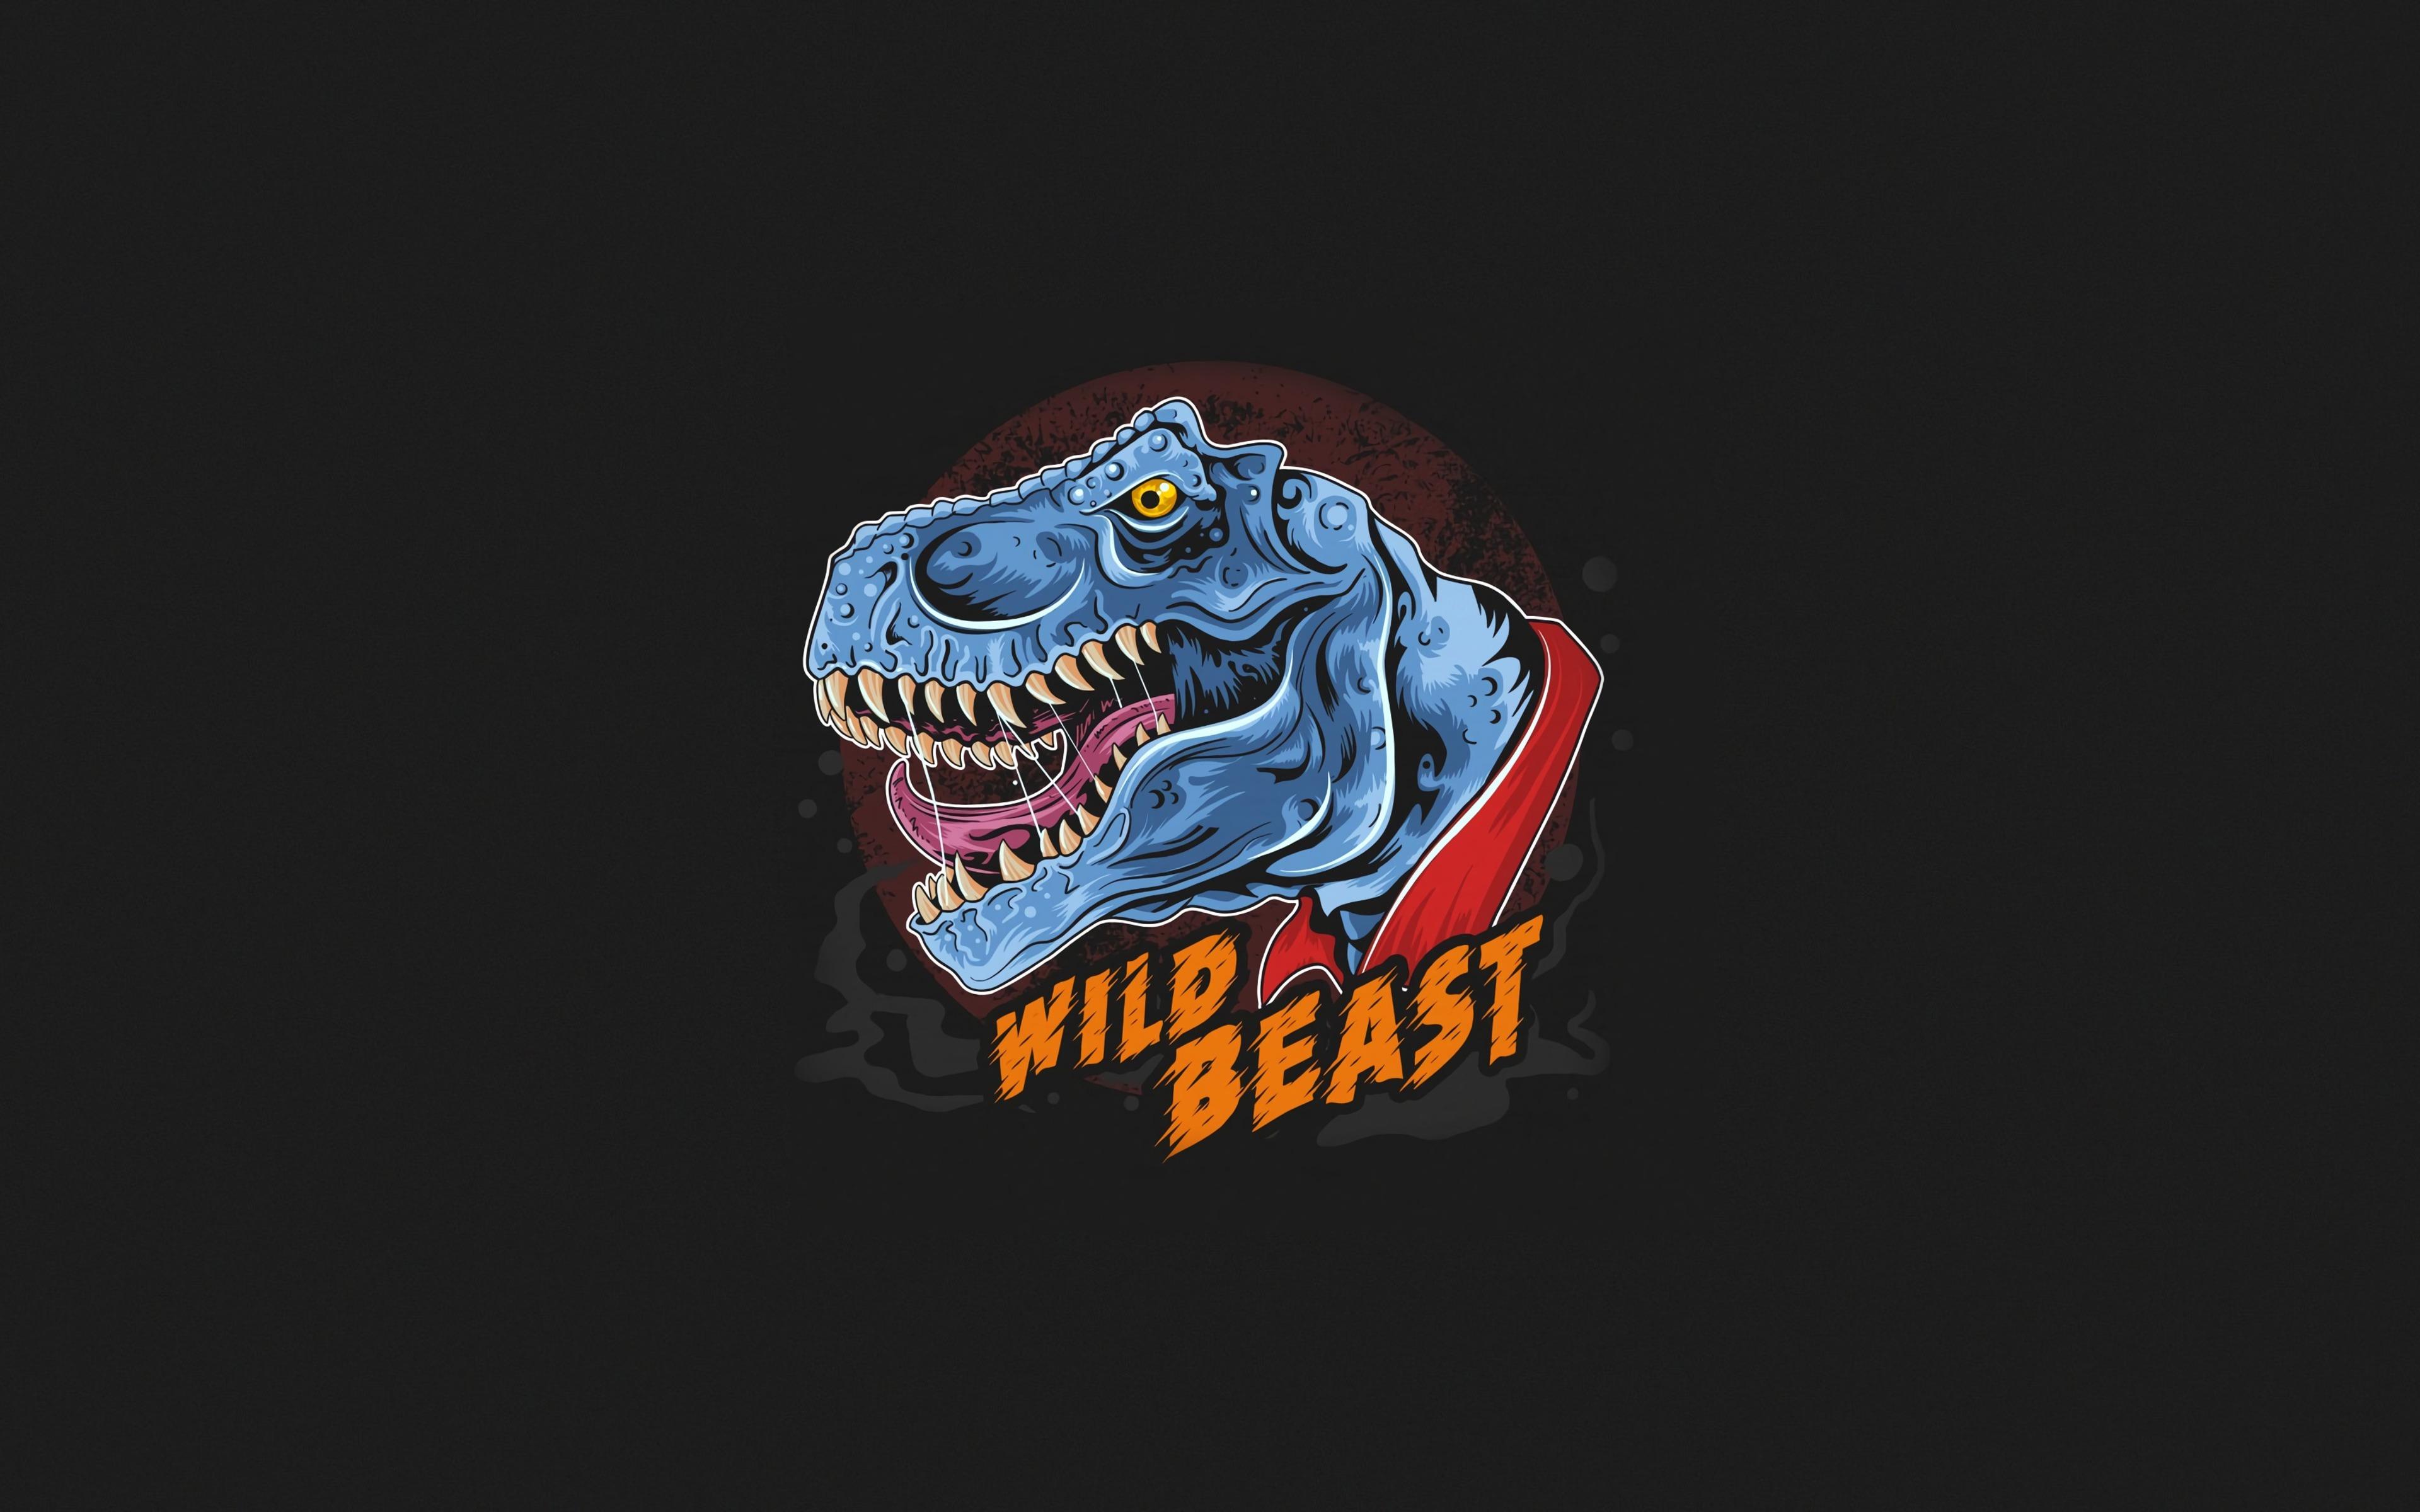 dinosaur-wild-beast-4k-gl.jpg